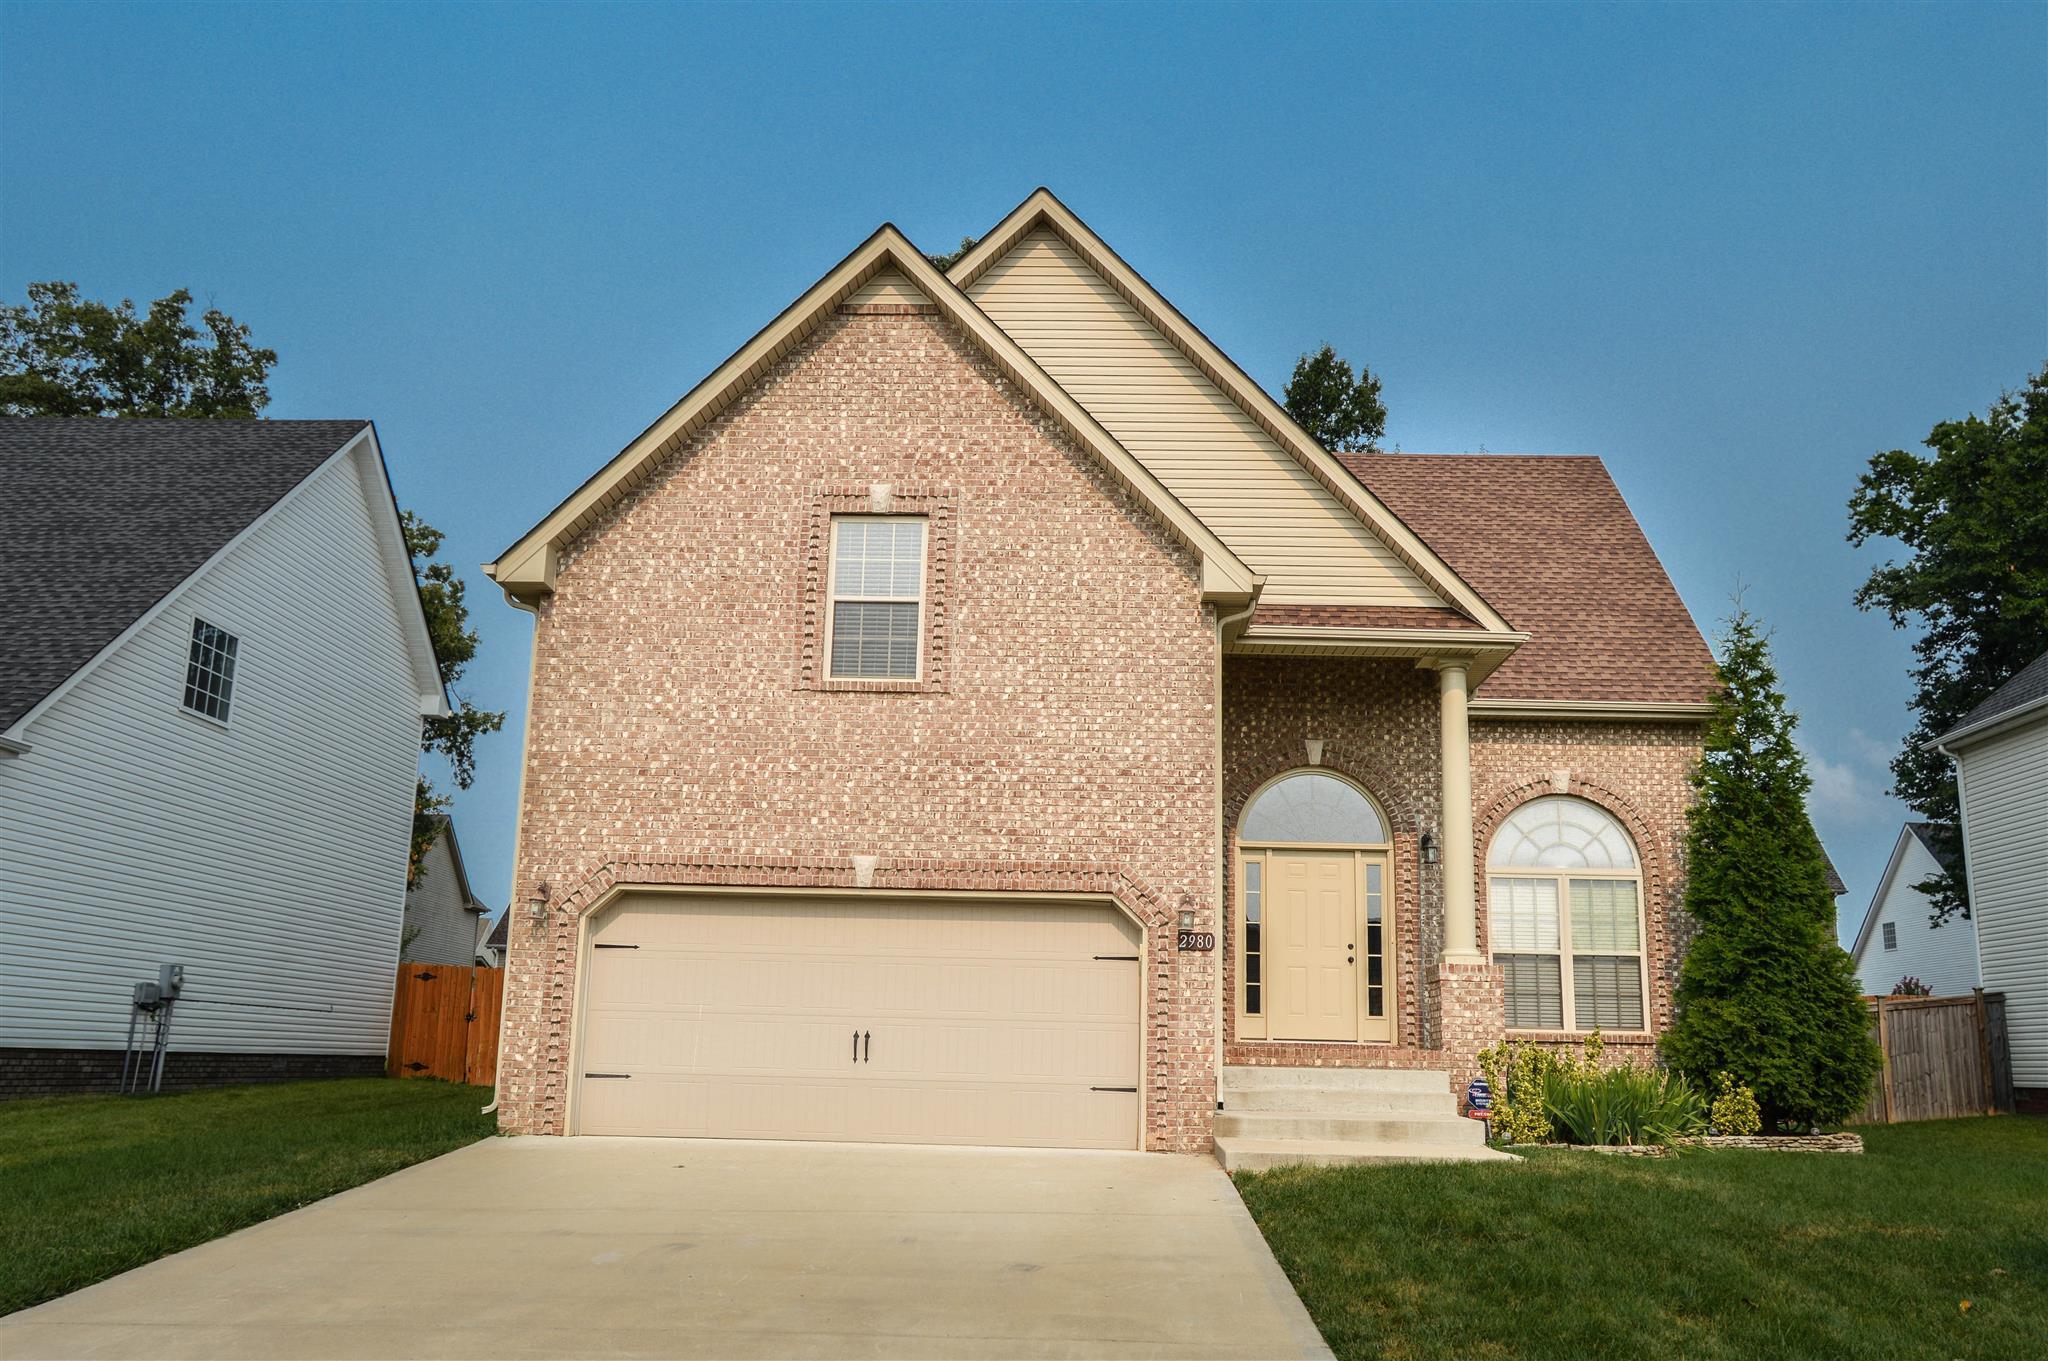 2980 Brewster Dr, Clarksville, TN 37042 - Clarksville, TN real estate listing